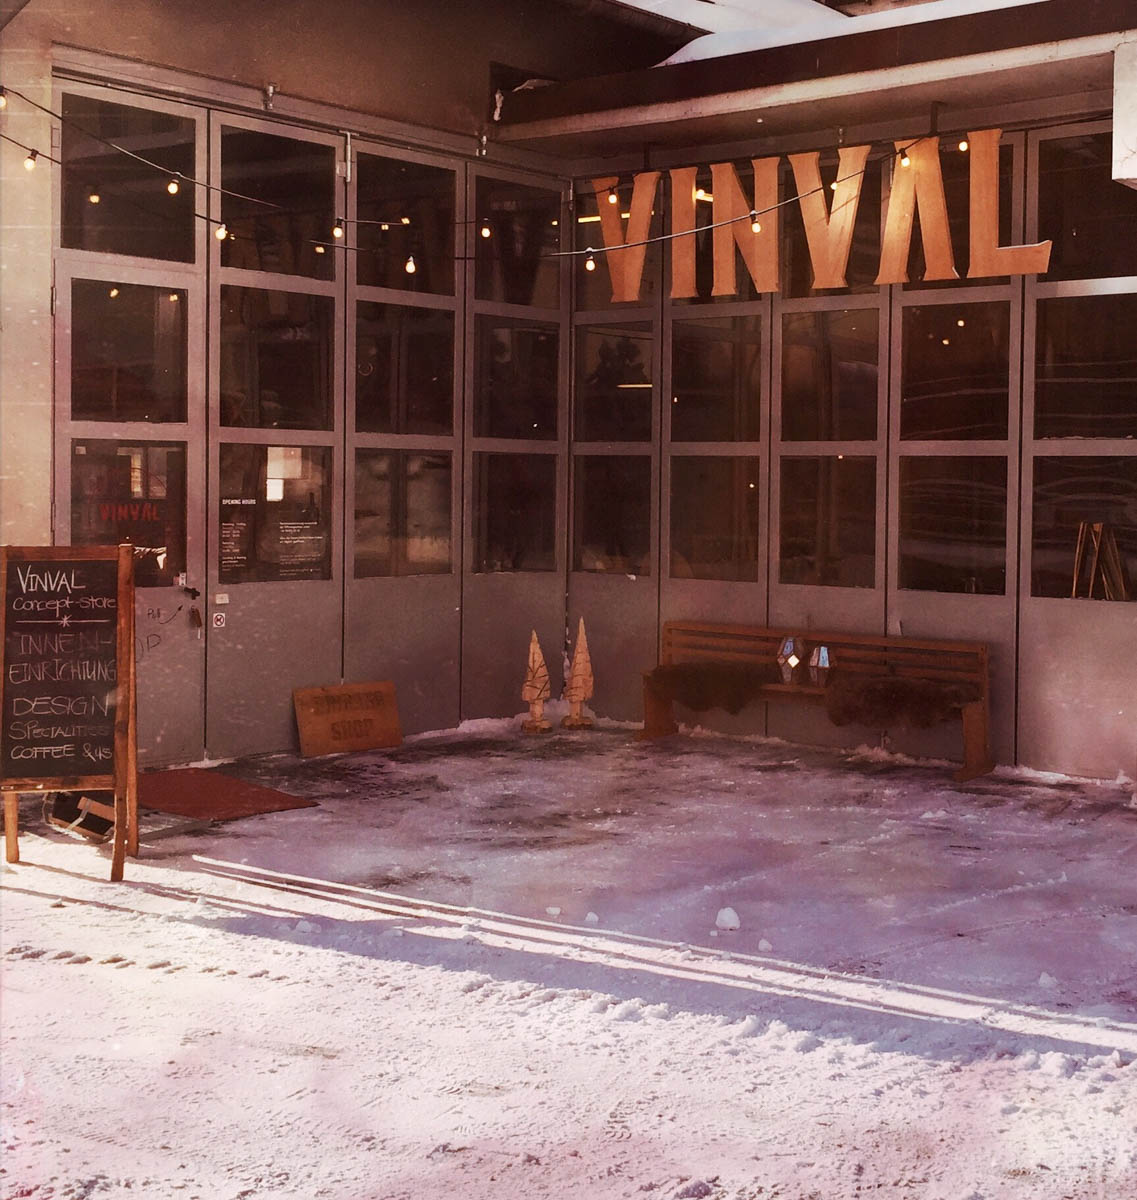 Kopie von Vinval Shop Valbella 2016